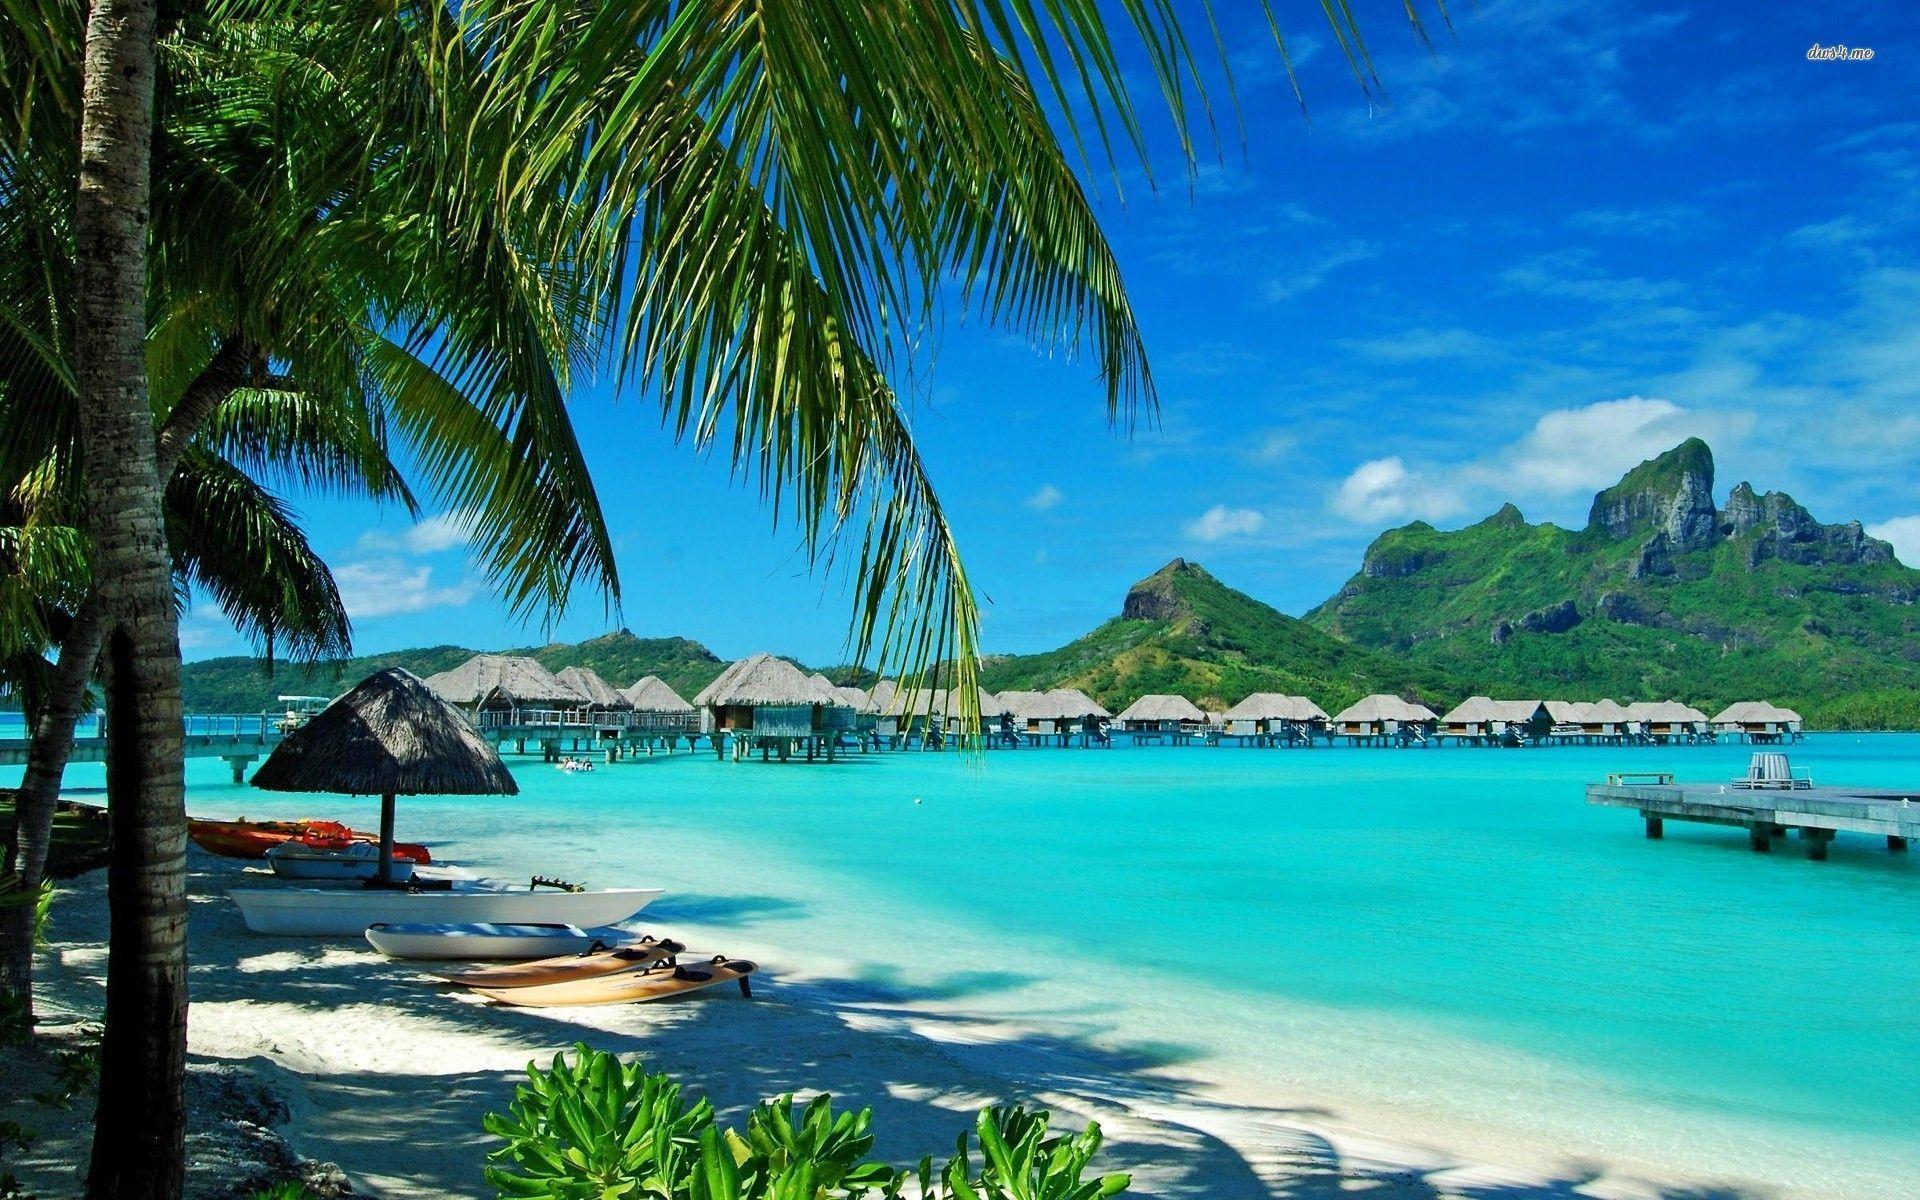 Hawaiian bungalows wallpaper - Beach wallpapers - #